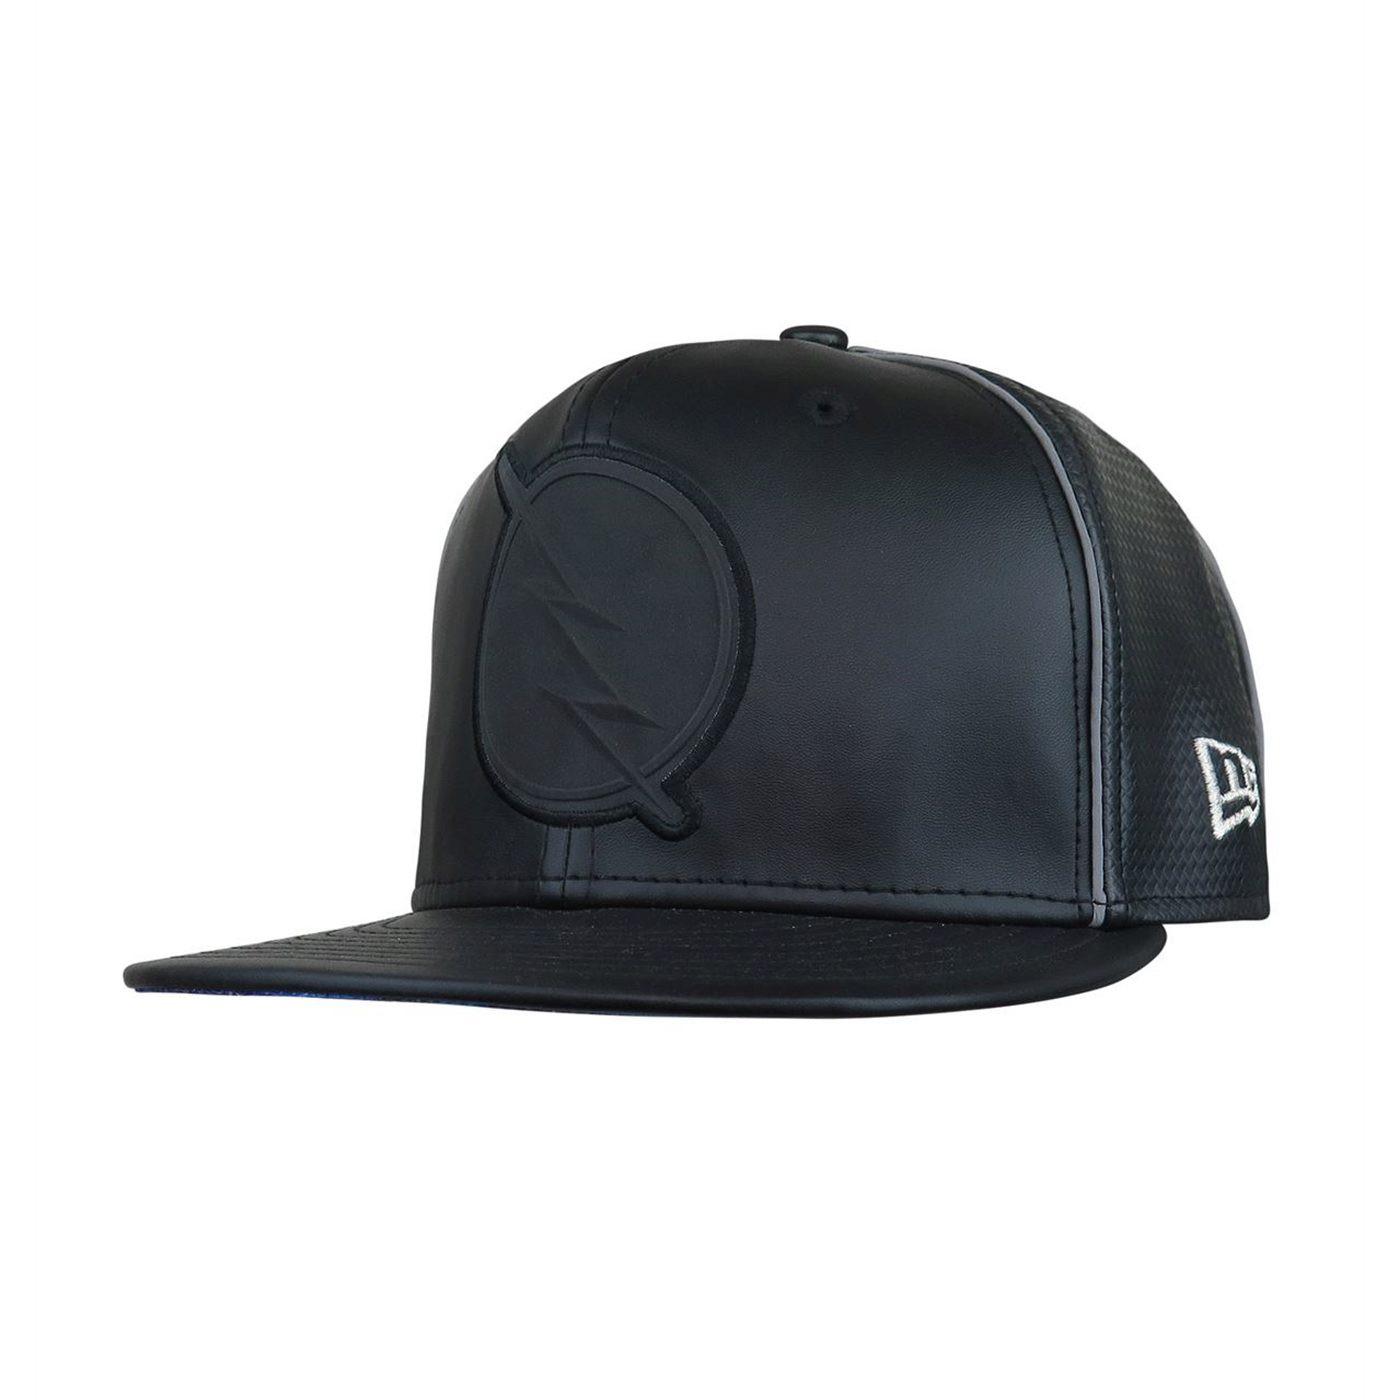 Flash Zoom Reflective Armor 9Fifty Snapback Hat